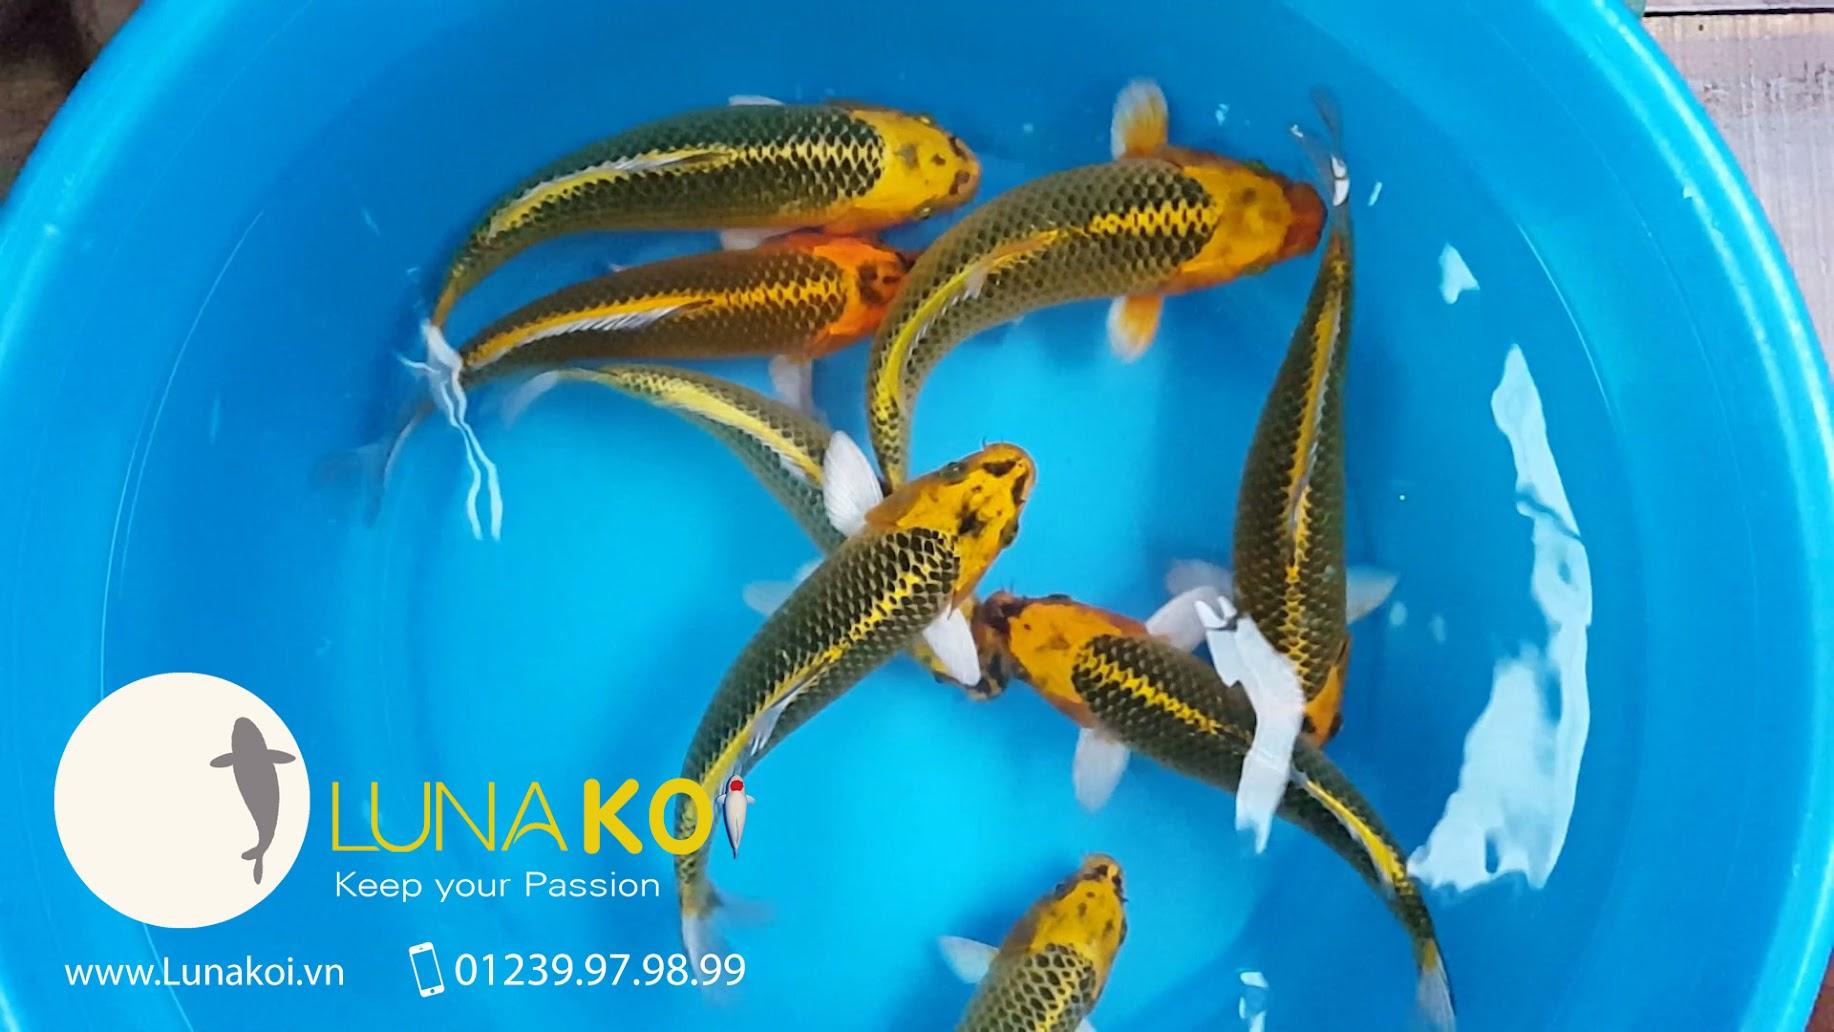 Matsuba F1 trang trại cá koi luna